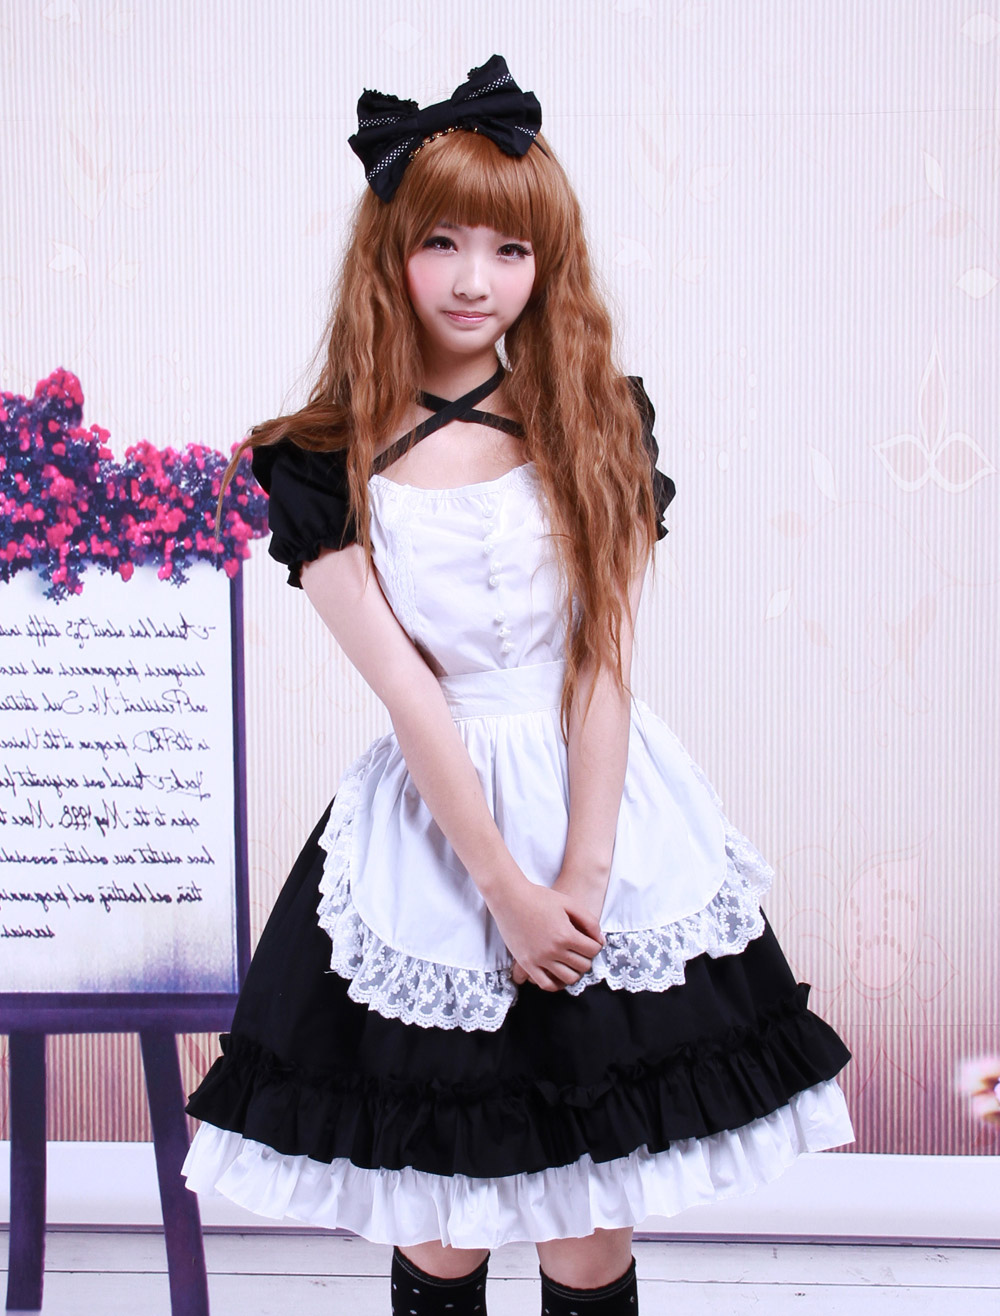 Cotton Black And White Cosplay Lolita Dress